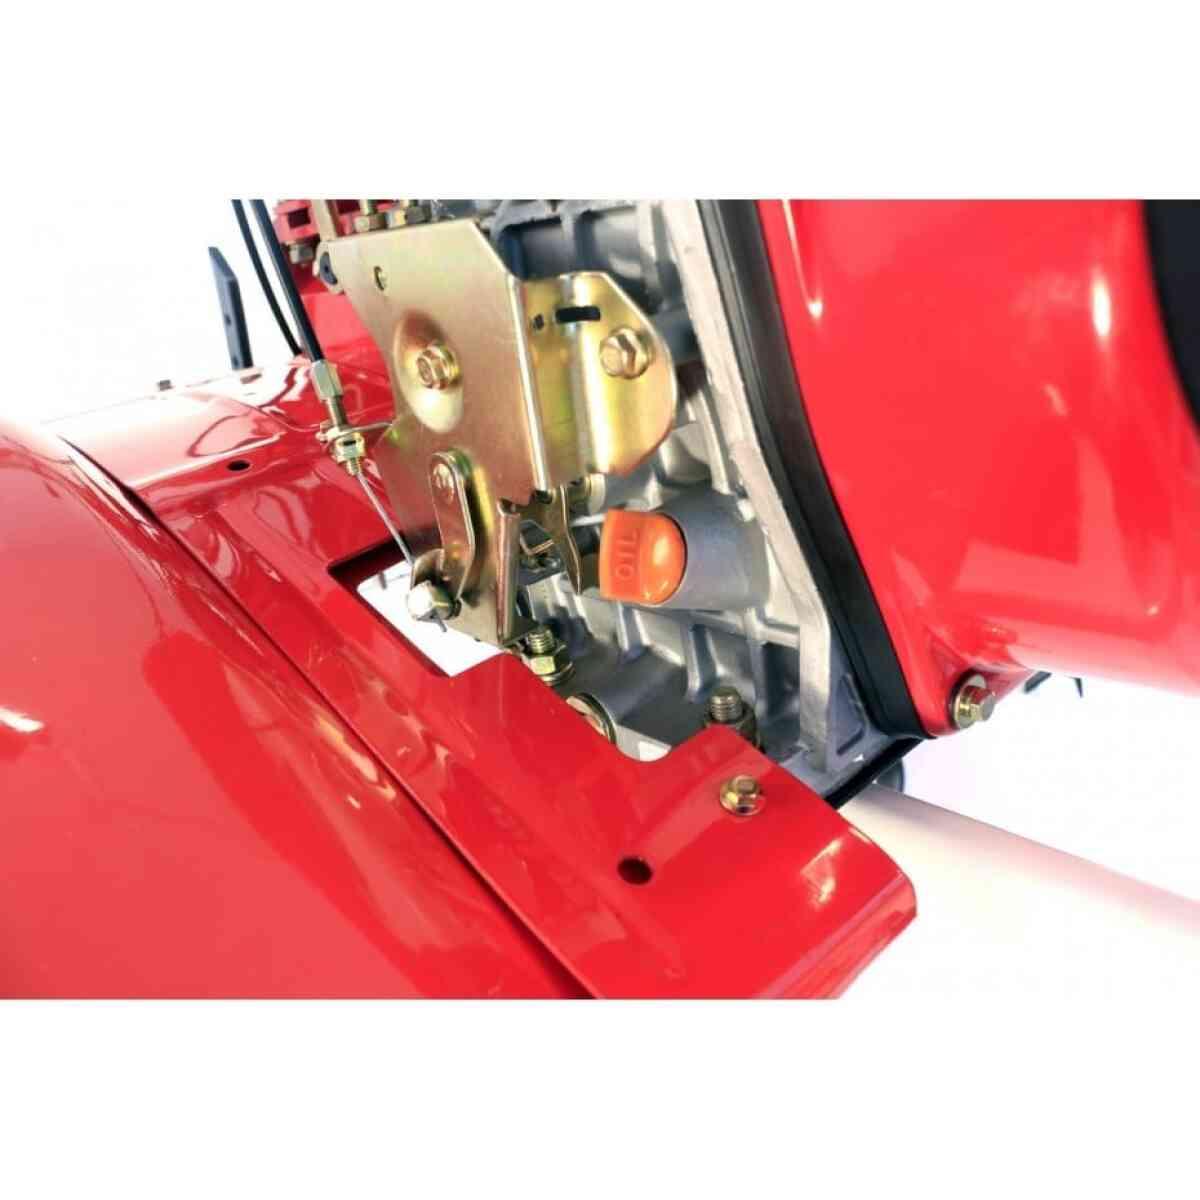 motocultor pro series new 1350 s o mac.ro 7 1 23